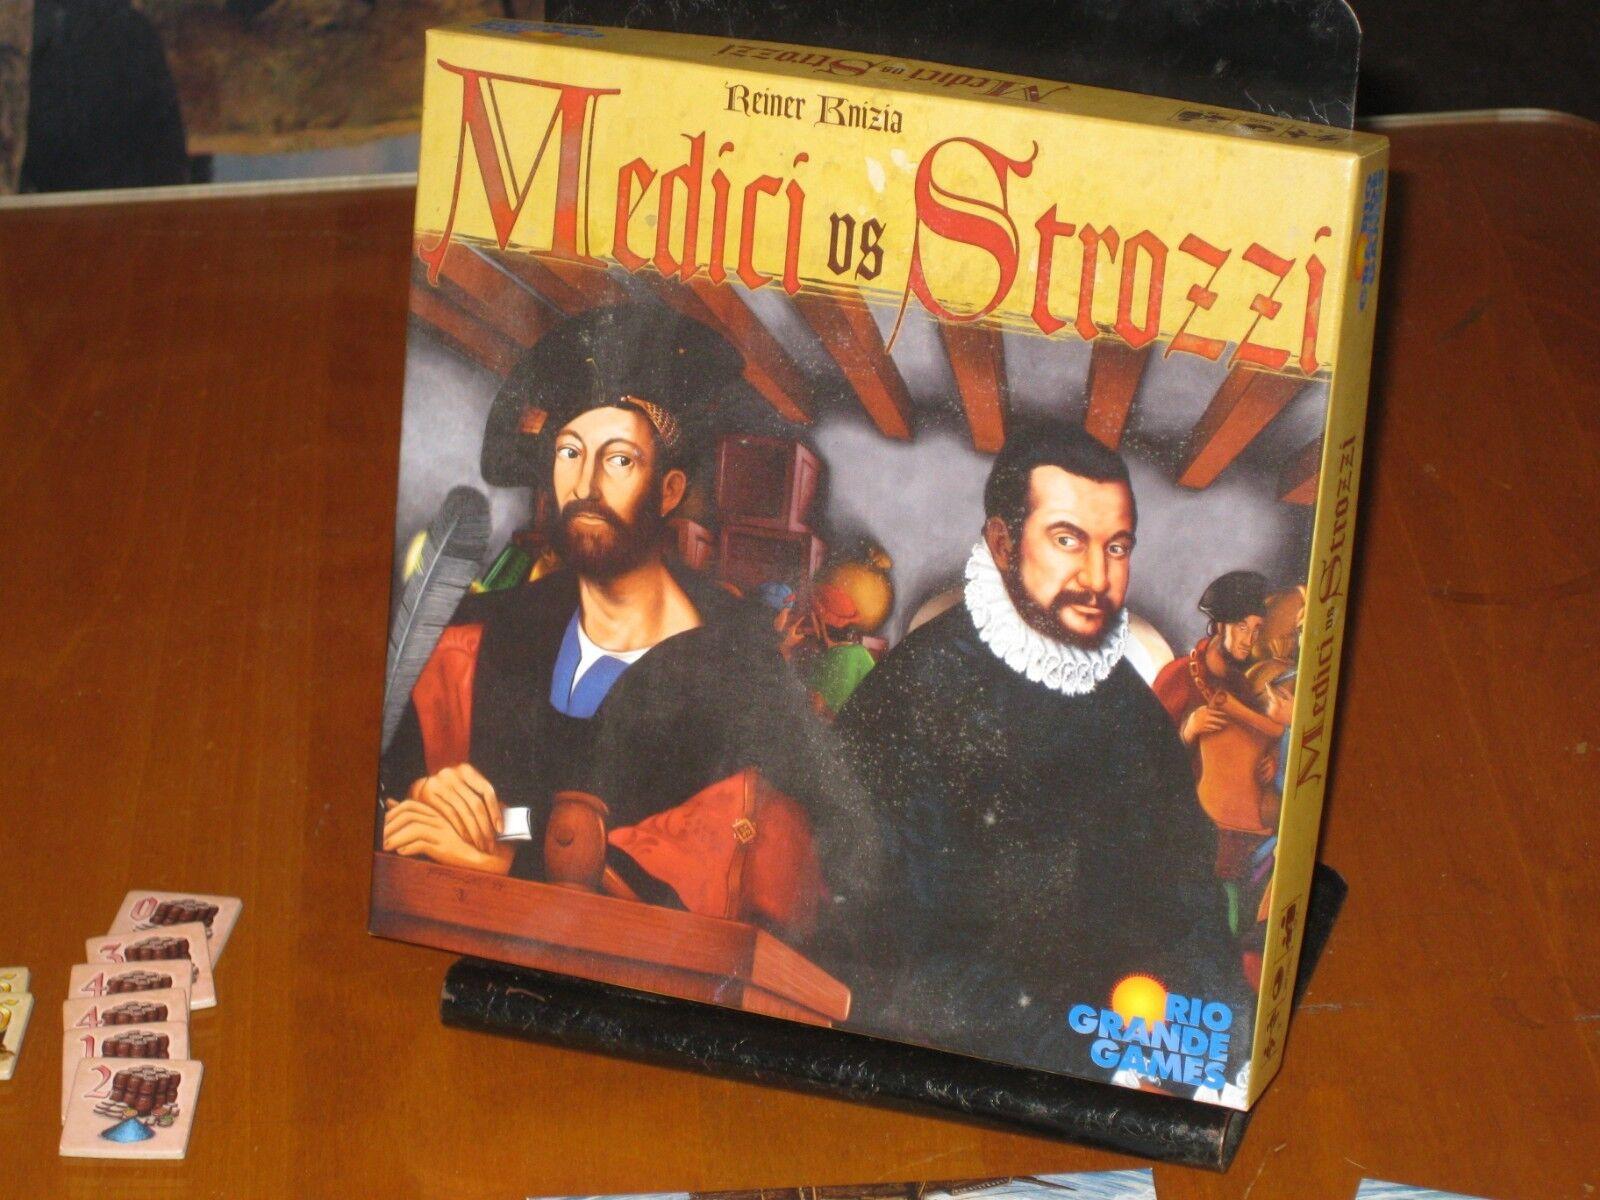 Medici vs strozzi - rio grande 2006 - brettspiel - oop - 100% komplett nm